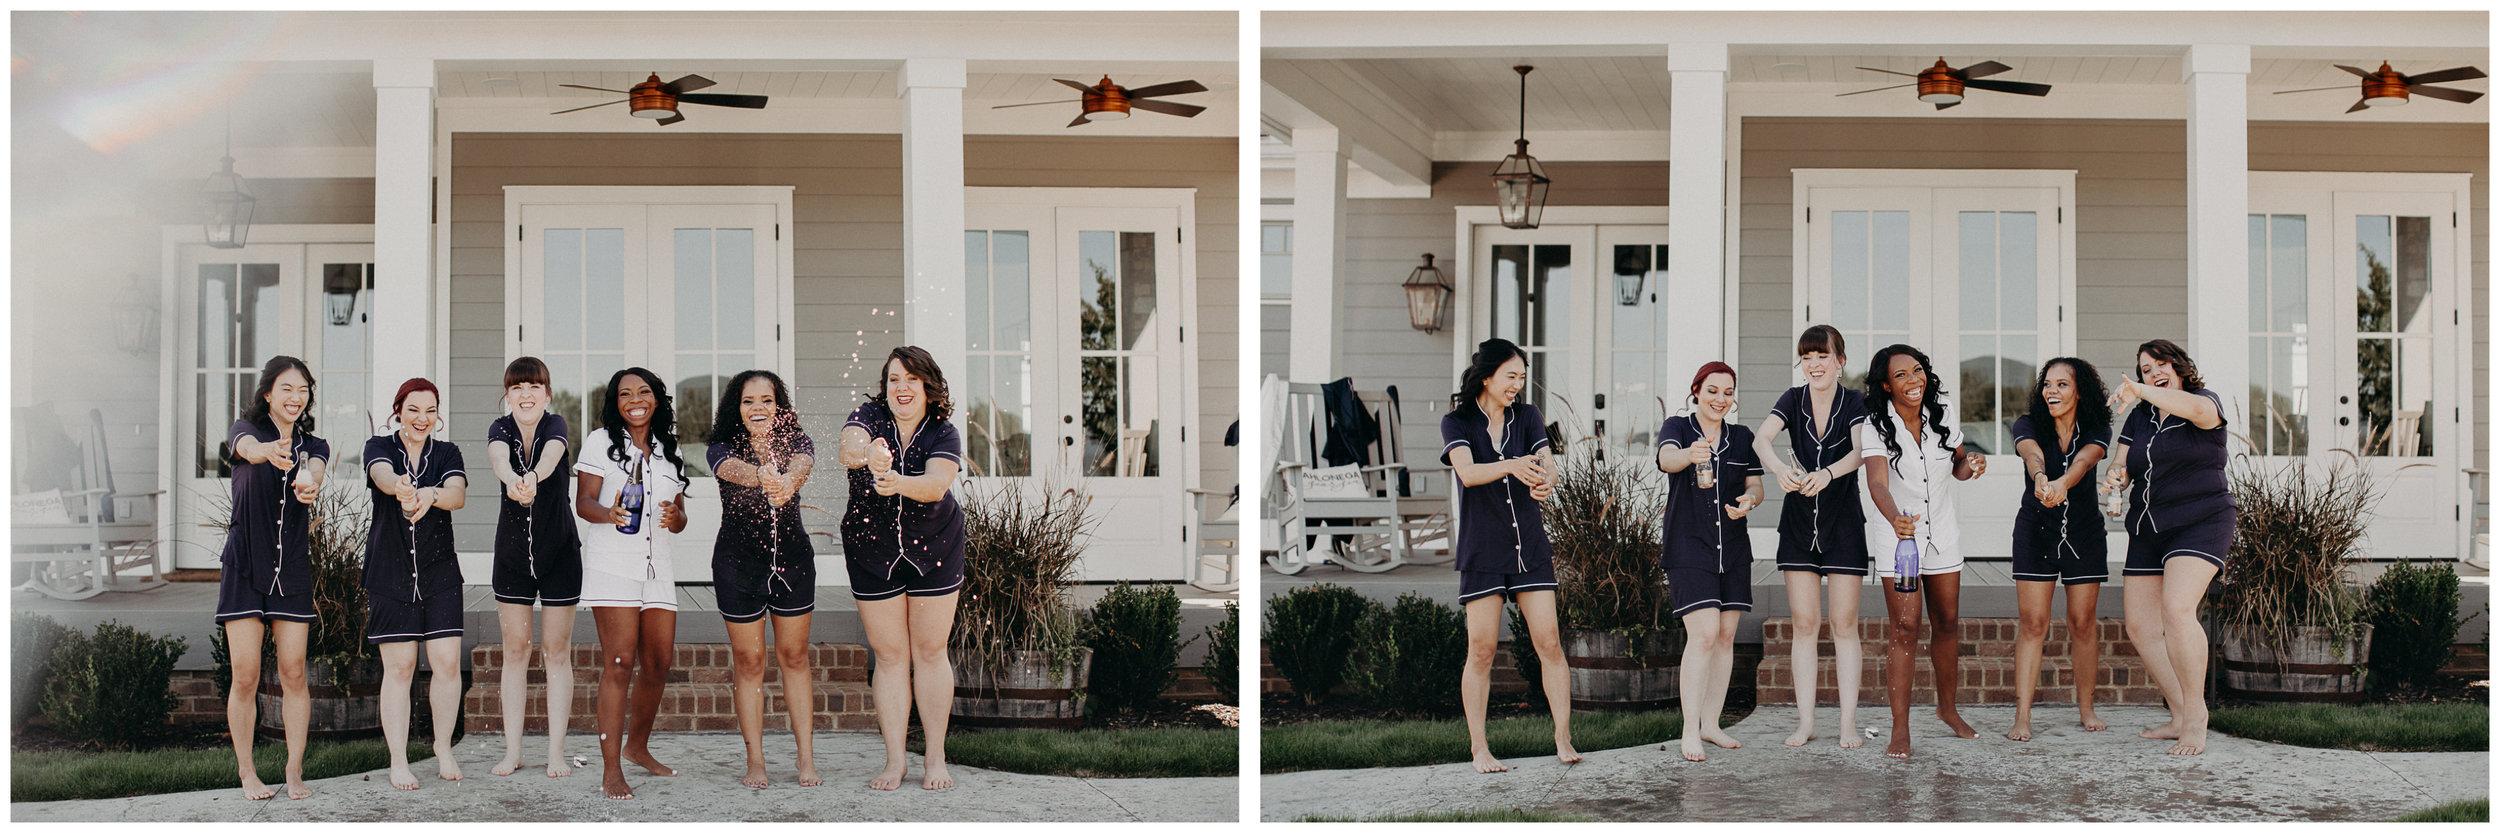 14.3Wedding_day_atlanta_georgia_bridesmaids_matching_pajamas_details_pop_the_champagne_aline_marin_photography_-5.jpg